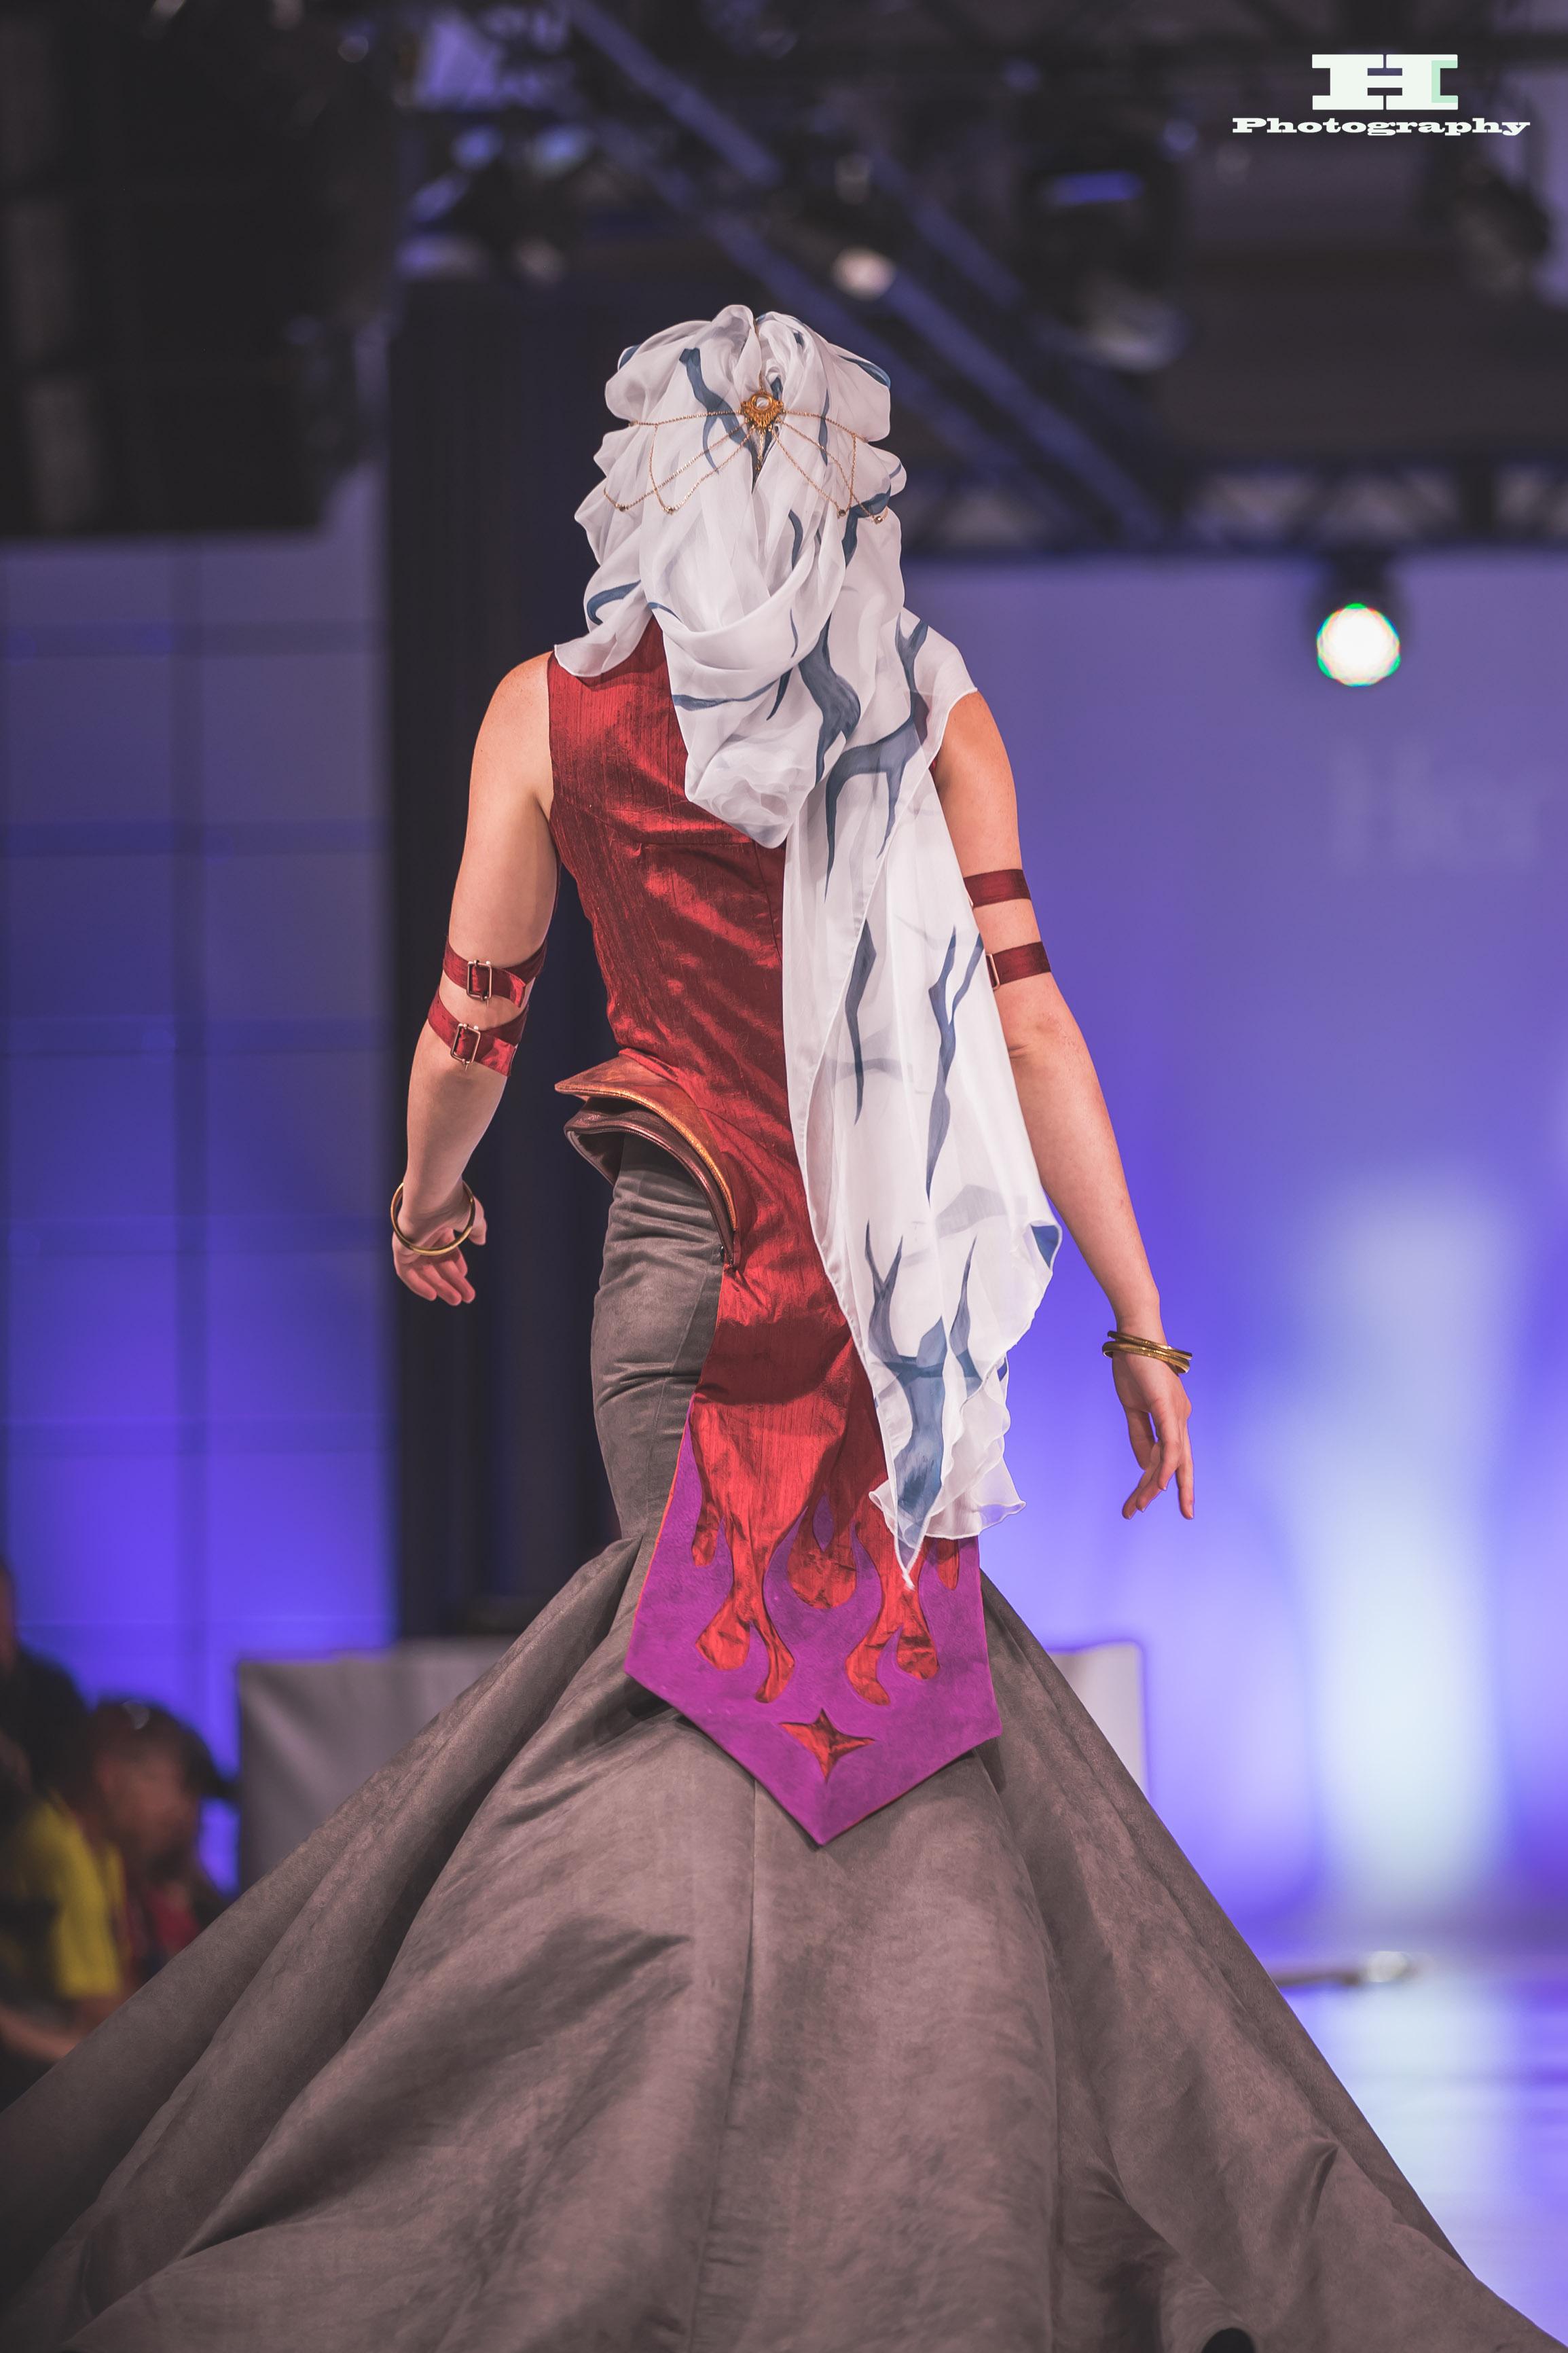 rachel-roth-tano-couture-runway02